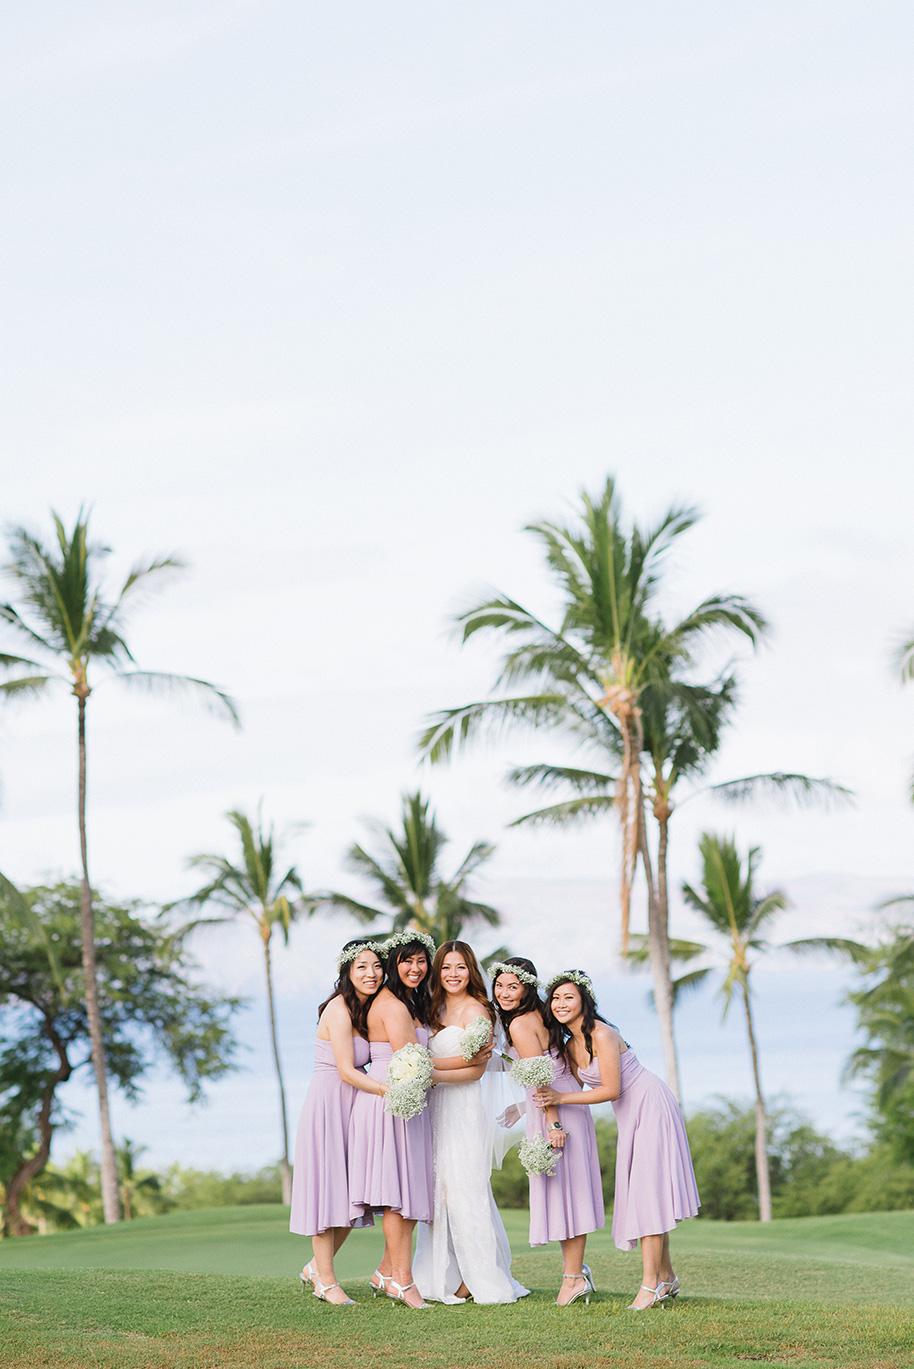 Maui-Wedding-052416-24